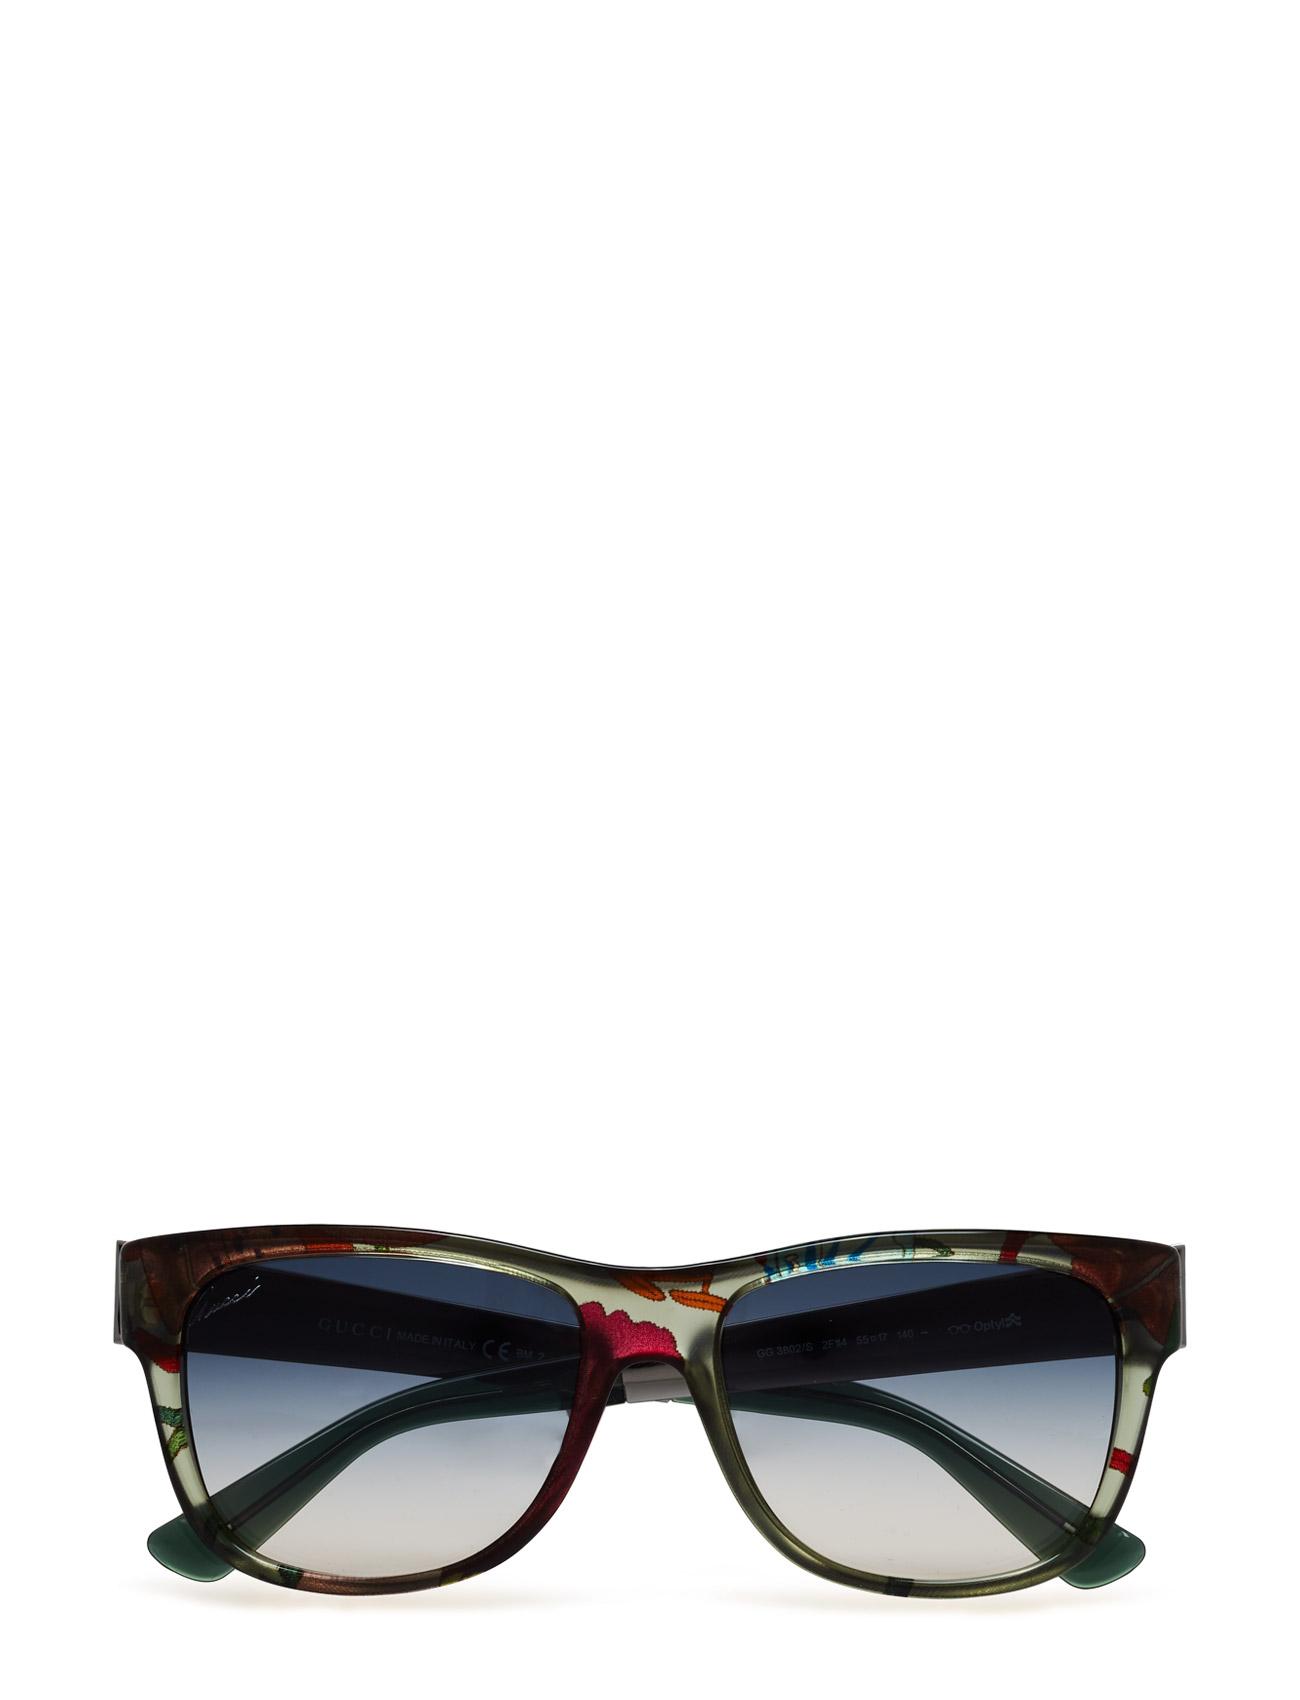 Gg 3802/S Gucci Sunglasses Solbriller til Damer i